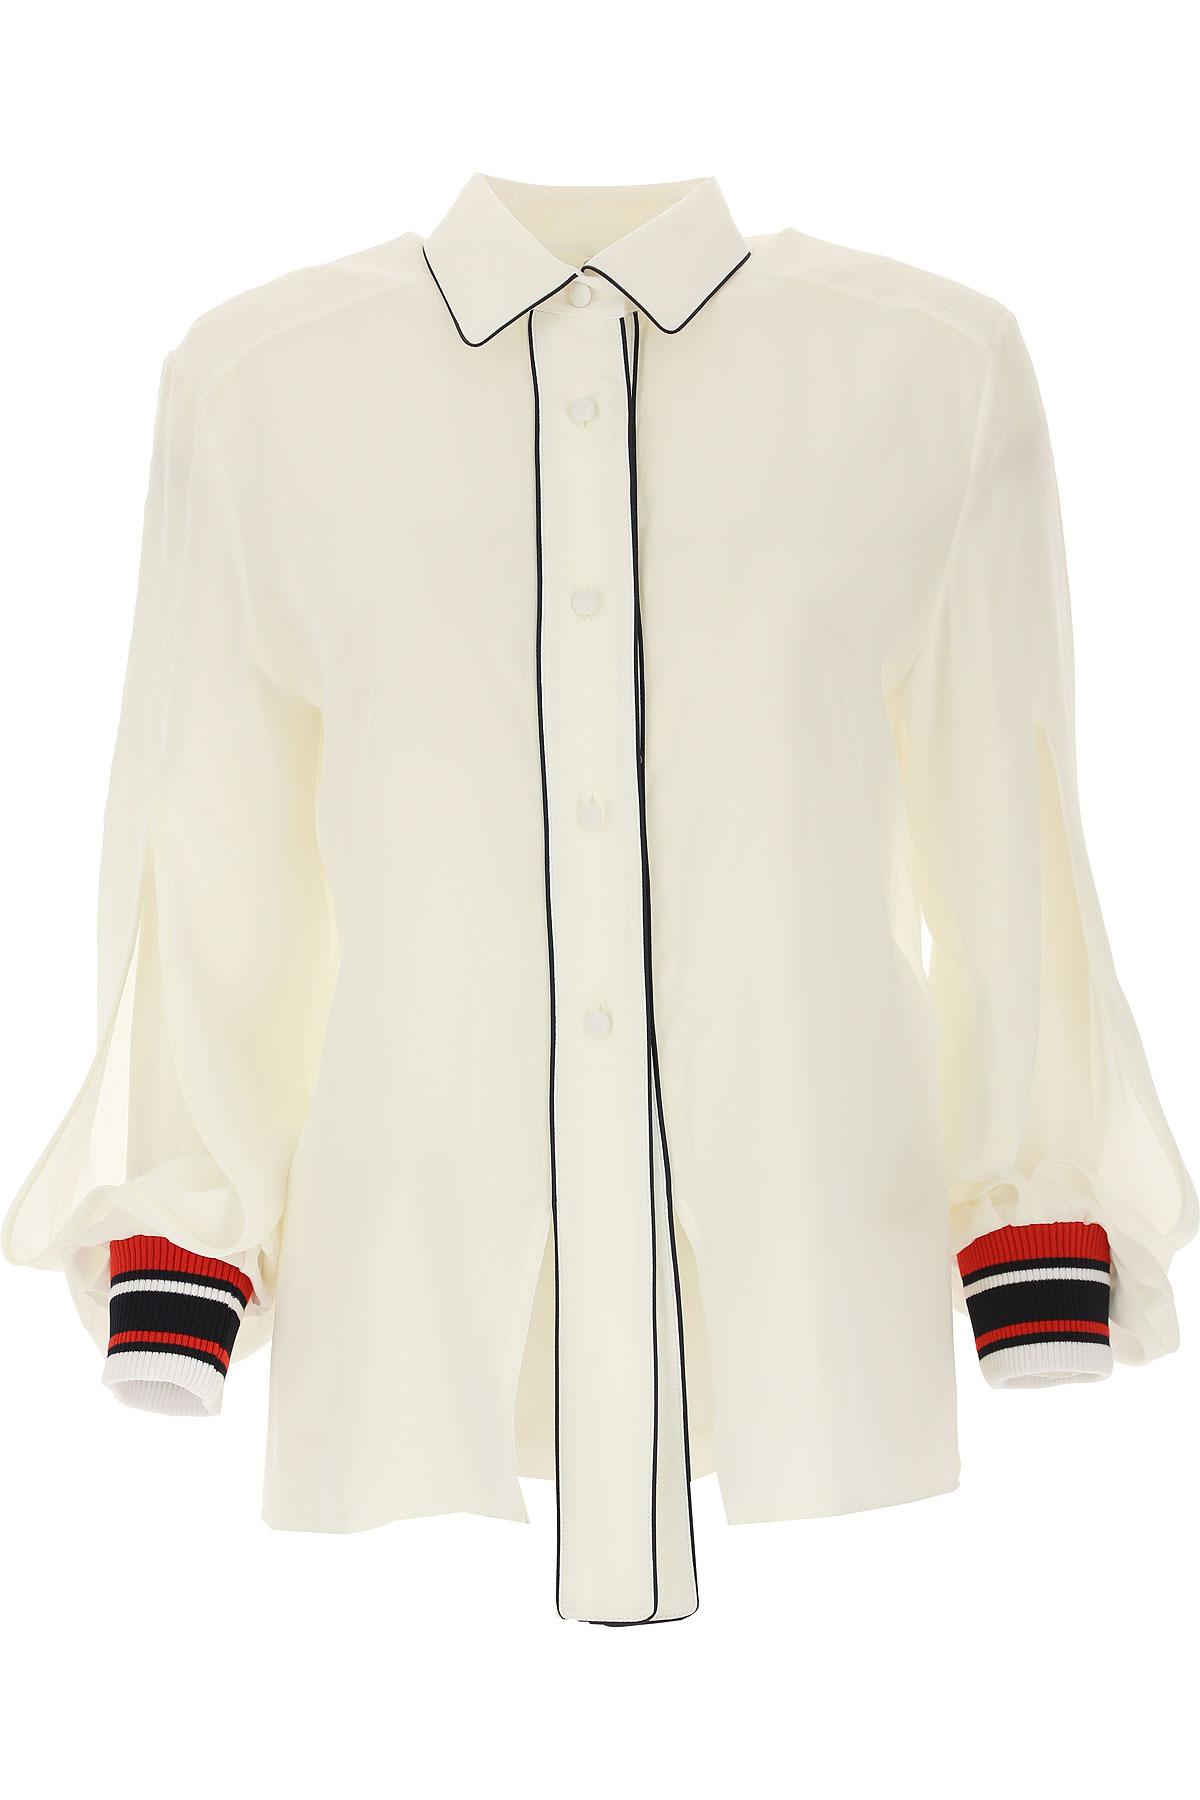 Golden Goose Shirt for Women On Sale, White, Silk, 2019, S (IT 40) M (IT 42 ) L (IT 44 )